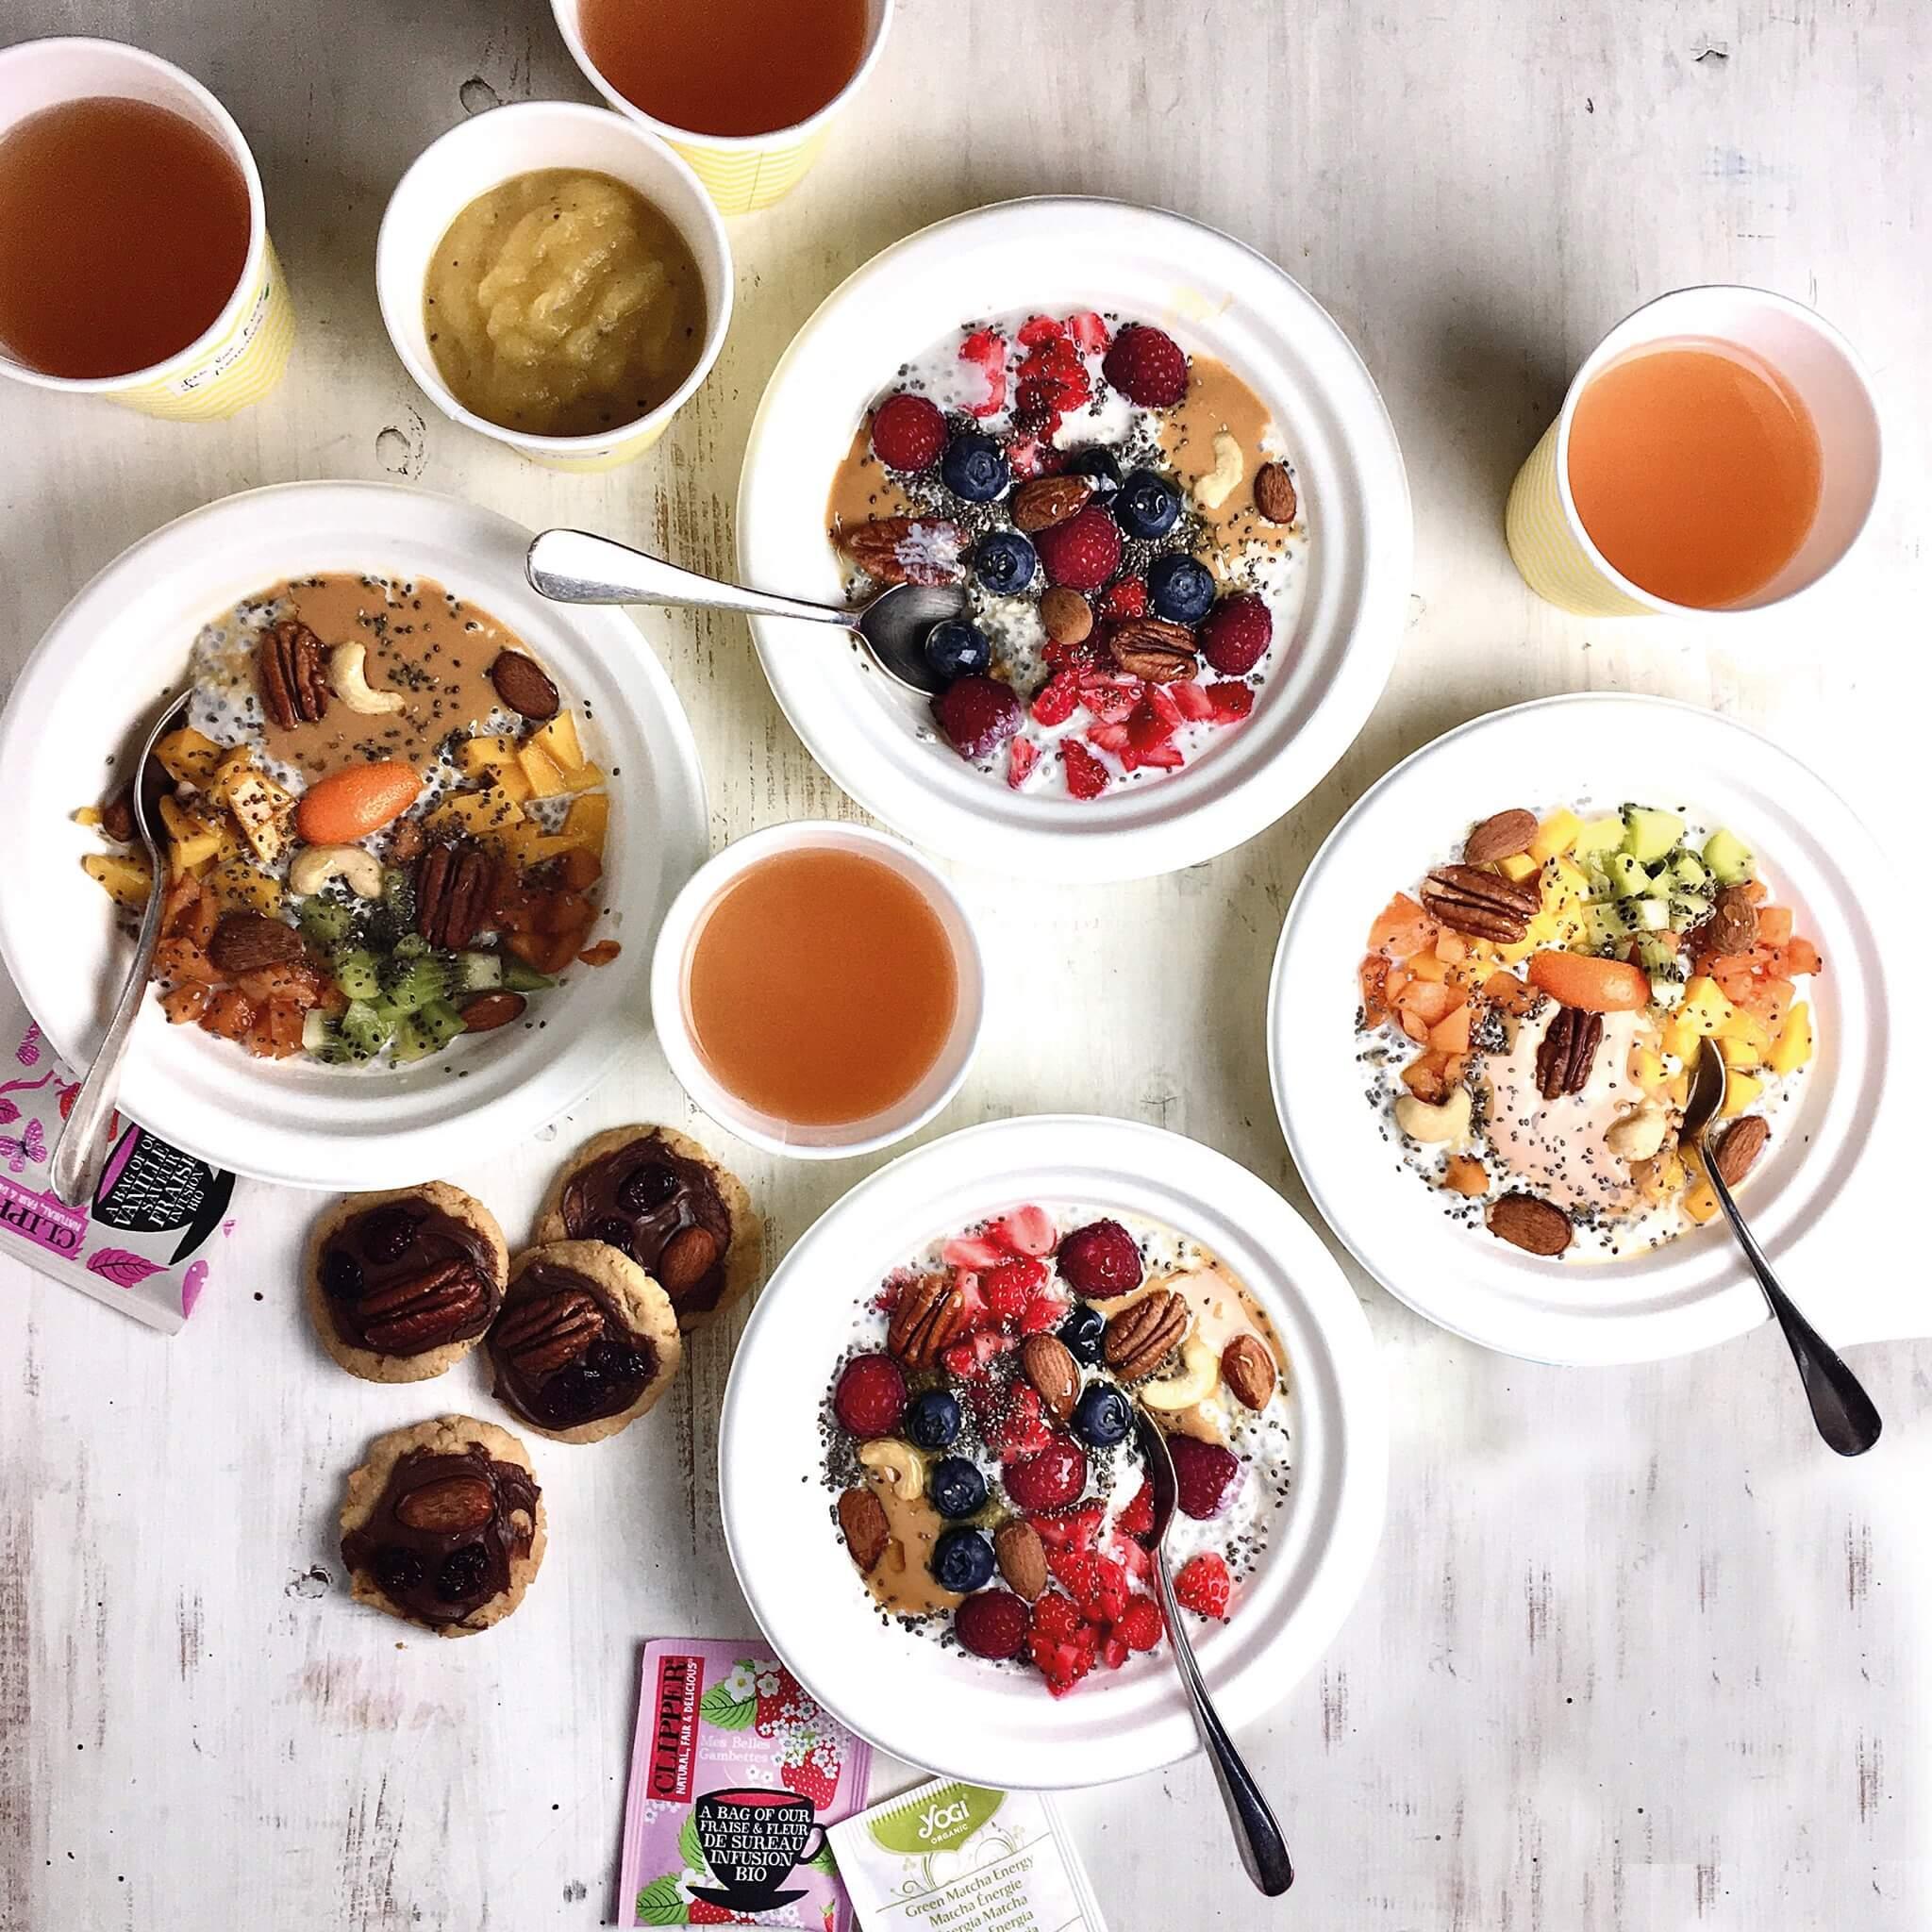 Petit déjeuner vegan healthy Vahina